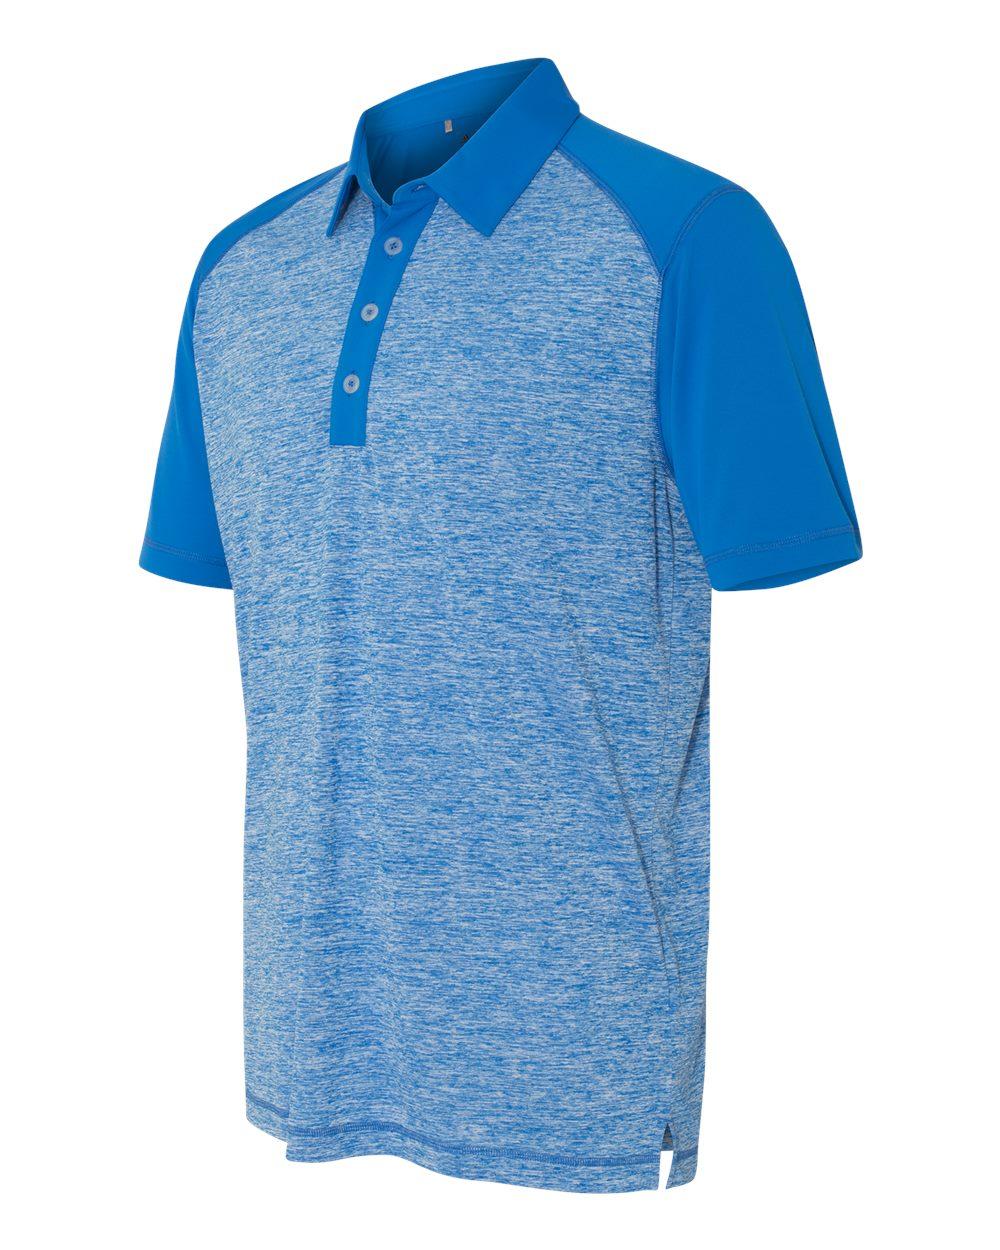 Adidas A145 - Golf Heather Colorblock Polo